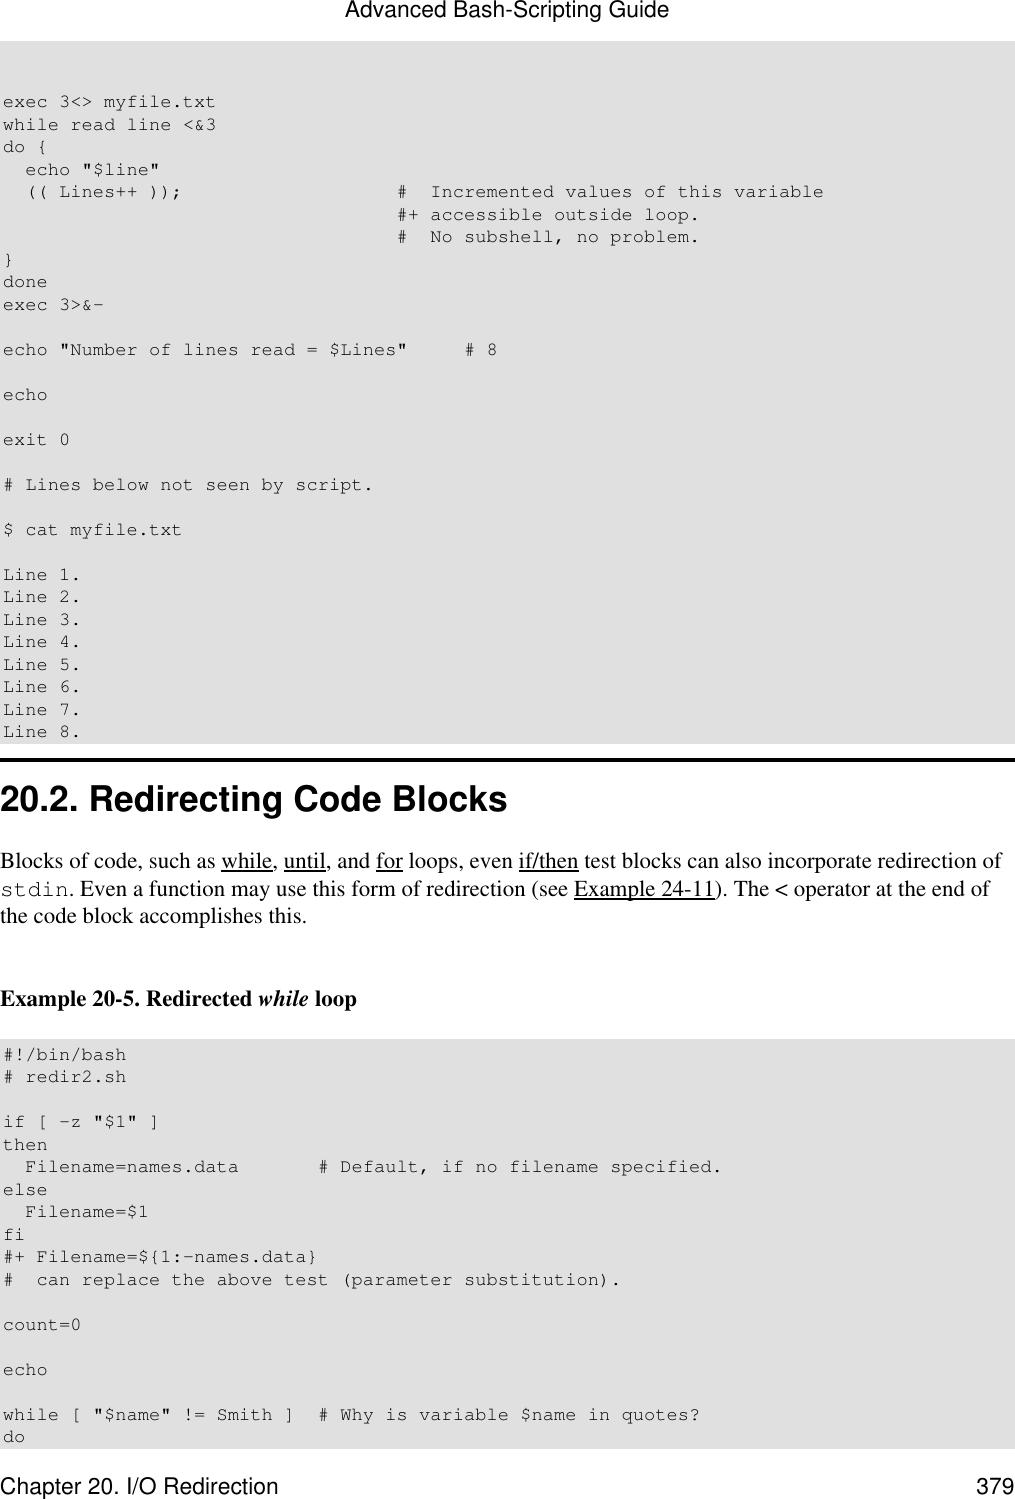 Bash For Loop Filename Bash loop through files and FTP them